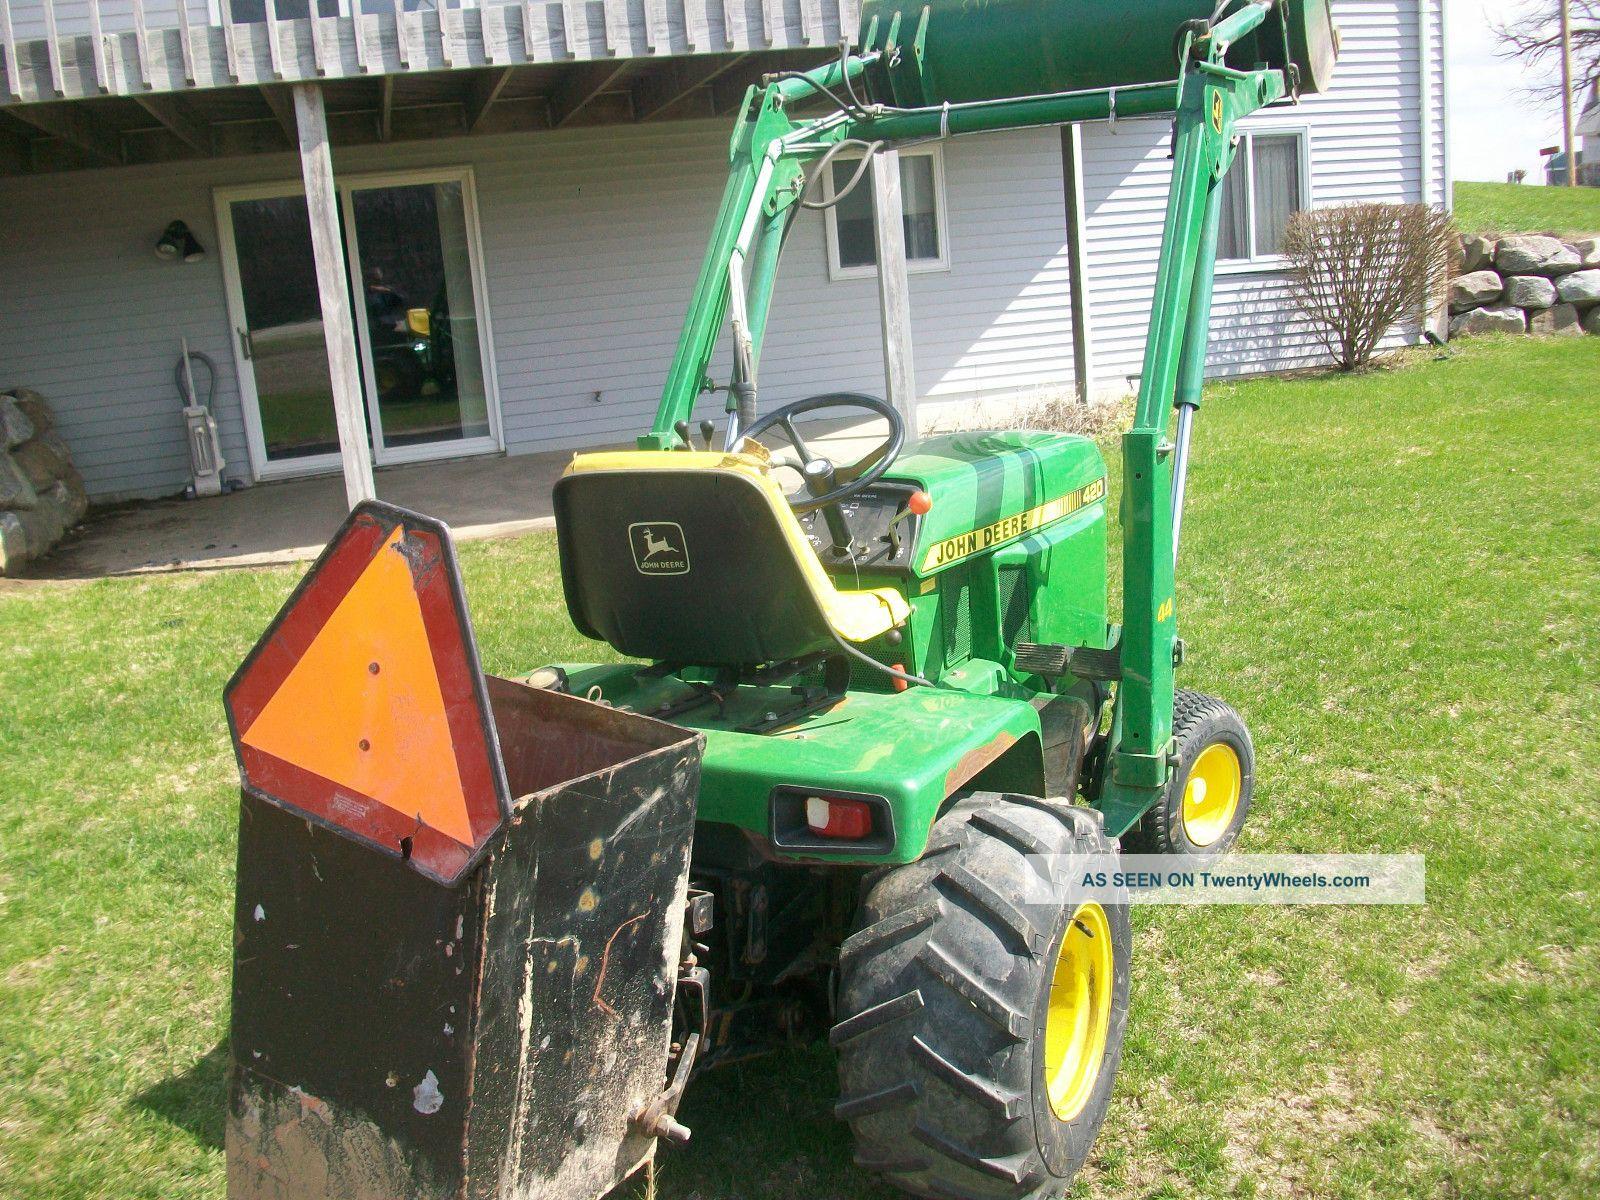 3 Point Hitch Garden Tractor : John deere garden tractor point hitch jd